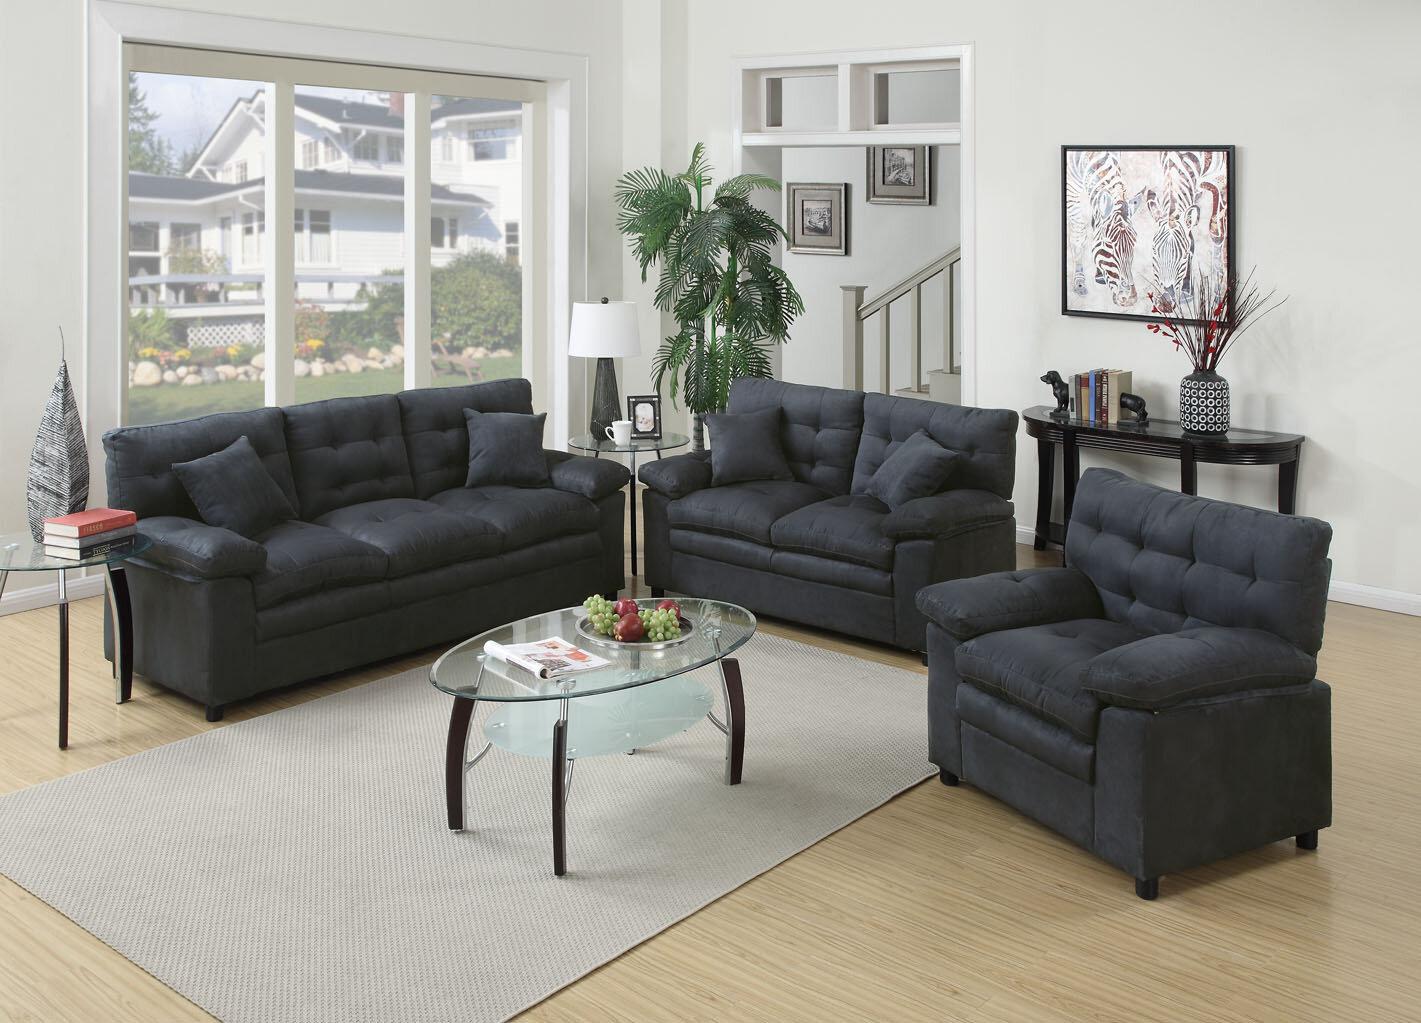 Kingston 3 Piece Living Room Set